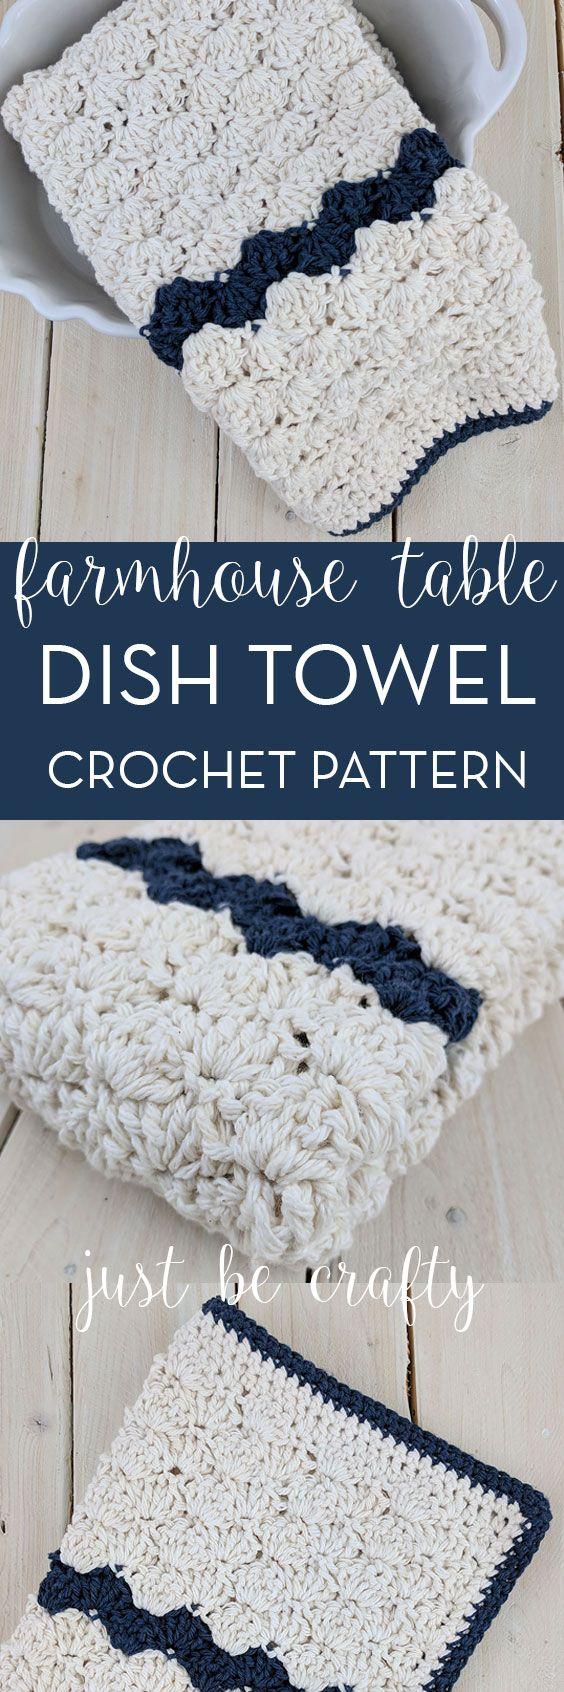 Crochet Farmhouse Table Dish Towel Pattern   Crochet   Pinterest ...